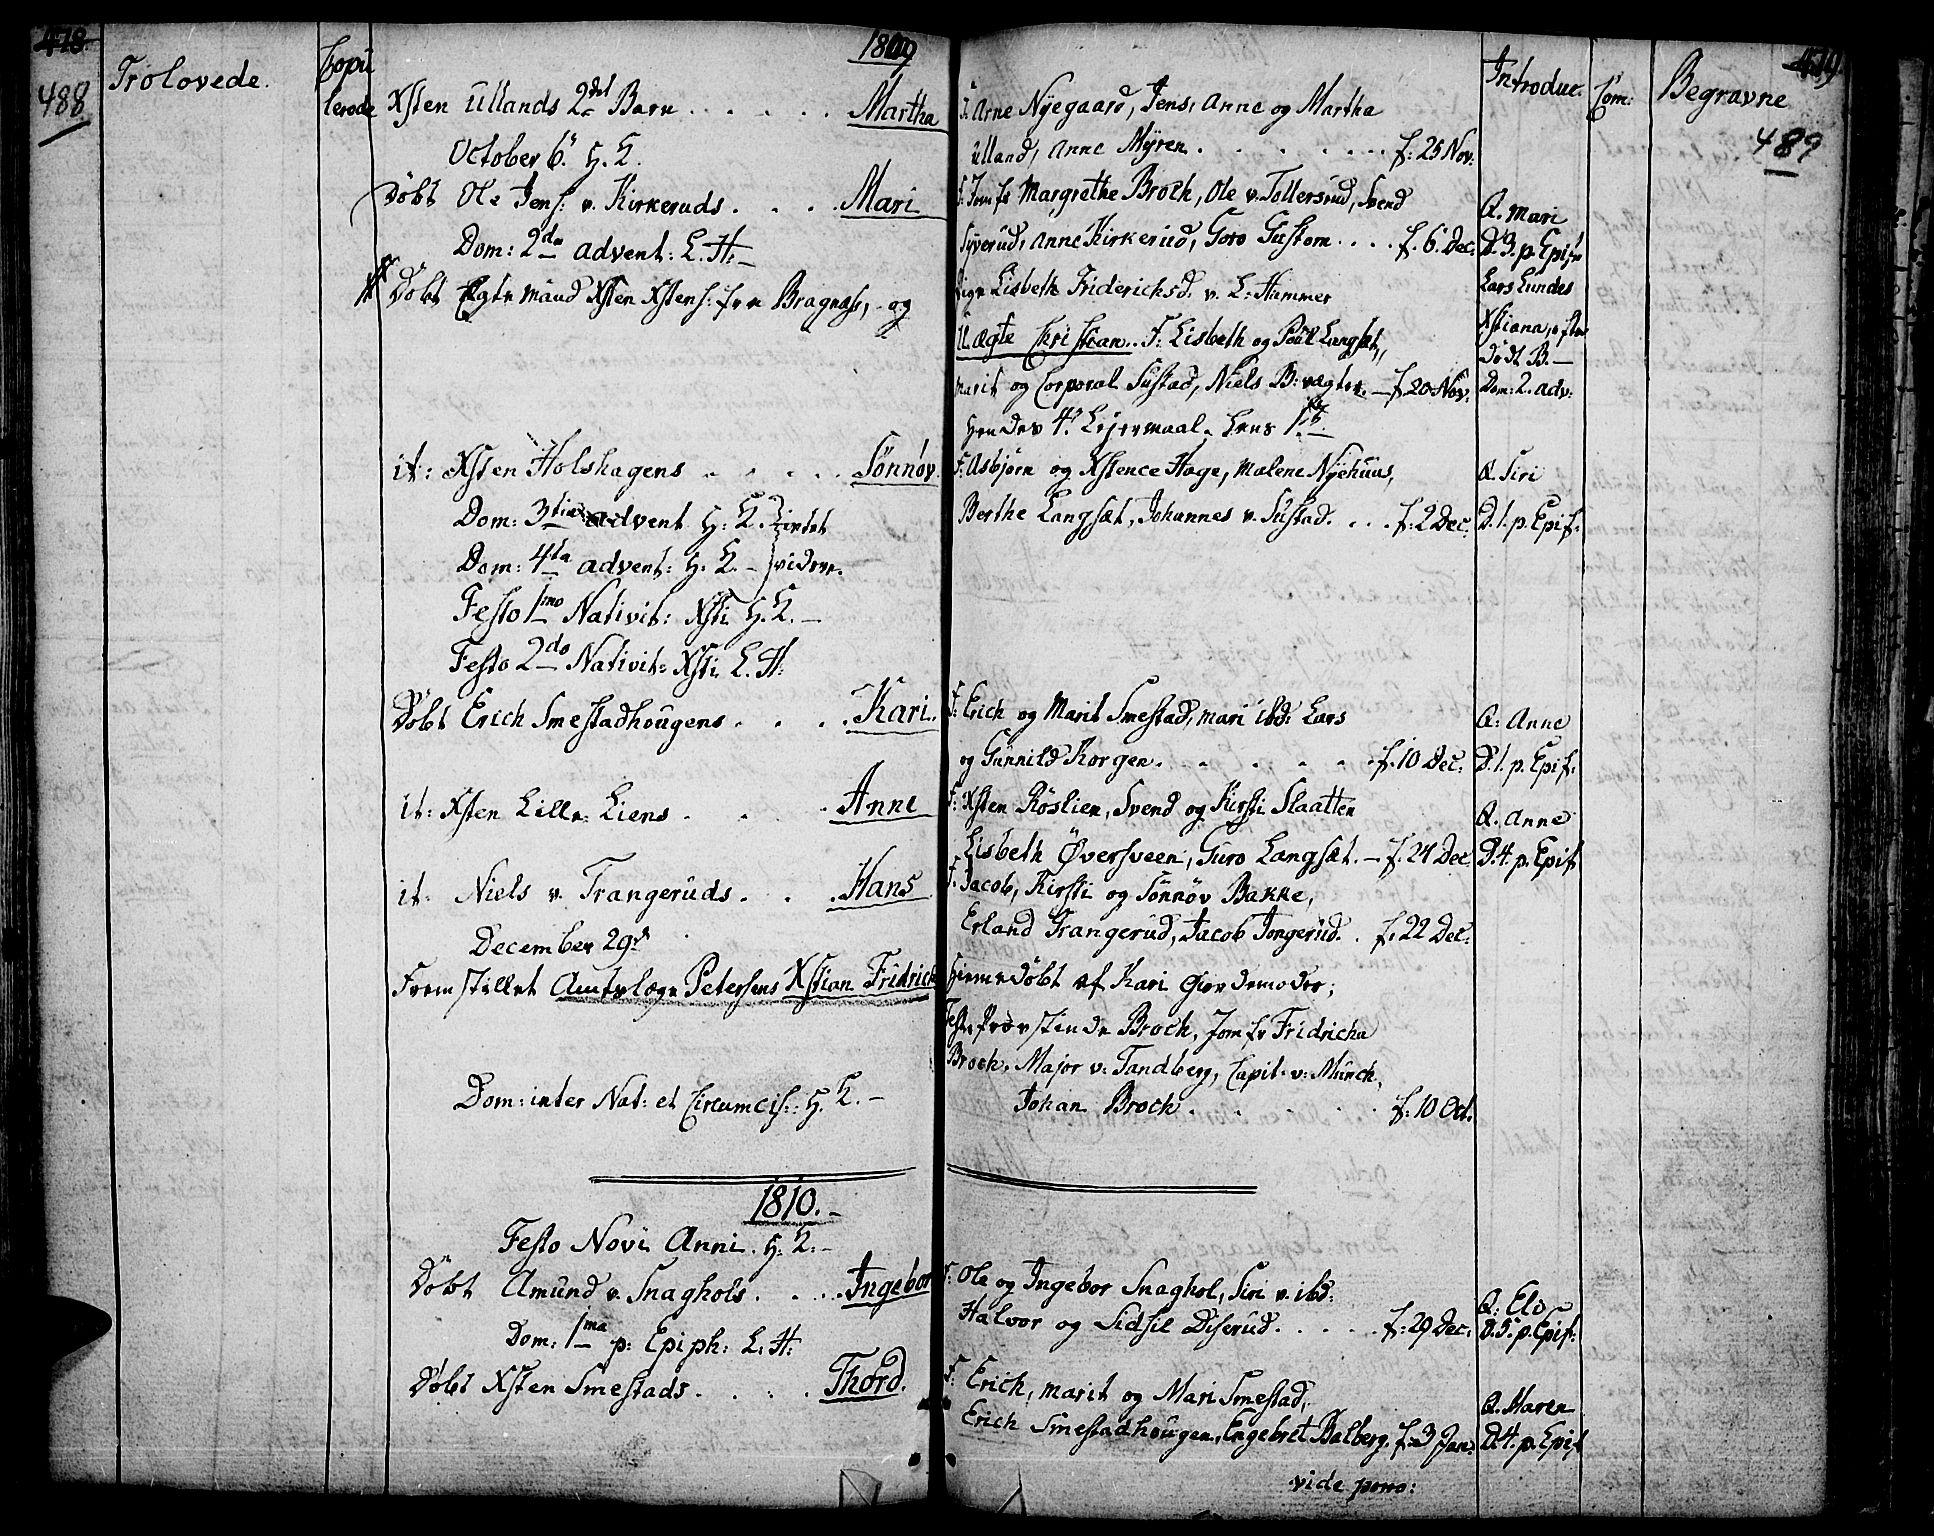 SAH, Fåberg prestekontor, Ministerialbok nr. 2, 1775-1818, s. 488-489